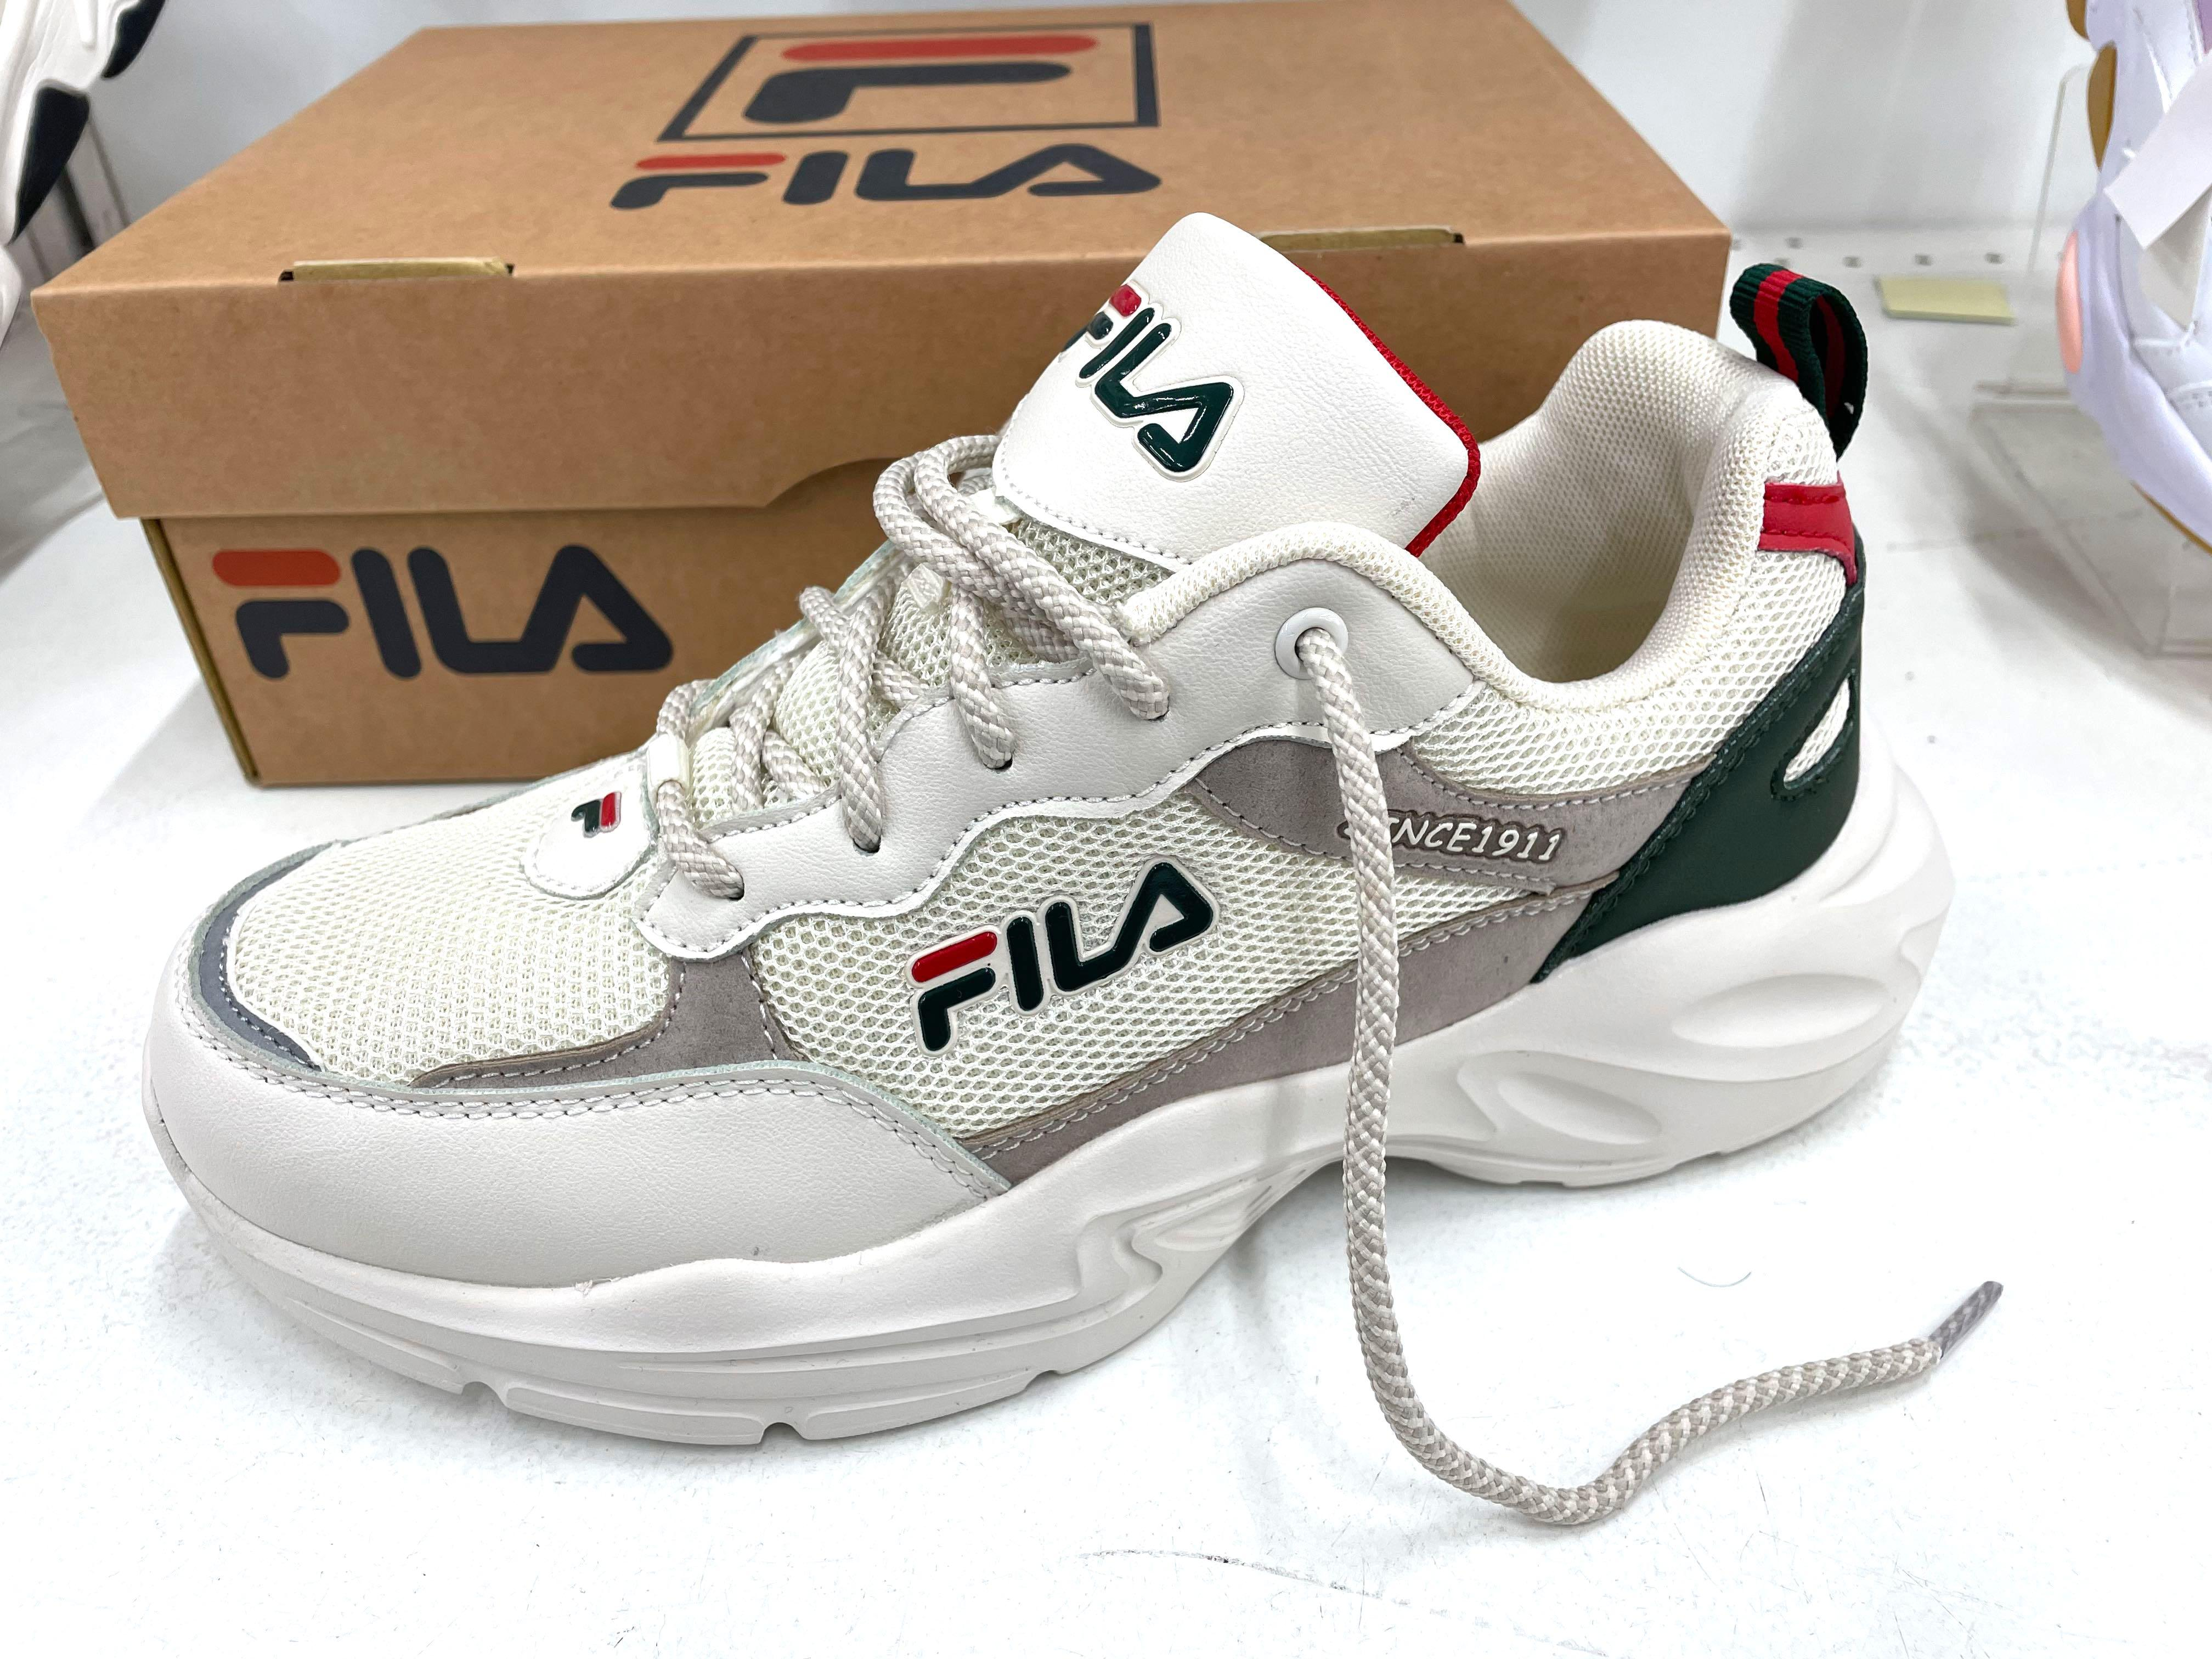 FILA Mesh jogging shoes retro style off-white men's running shoes 斐樂 網布慢跑鞋 復古風 米白色 男跑鞋 US8-US11.5